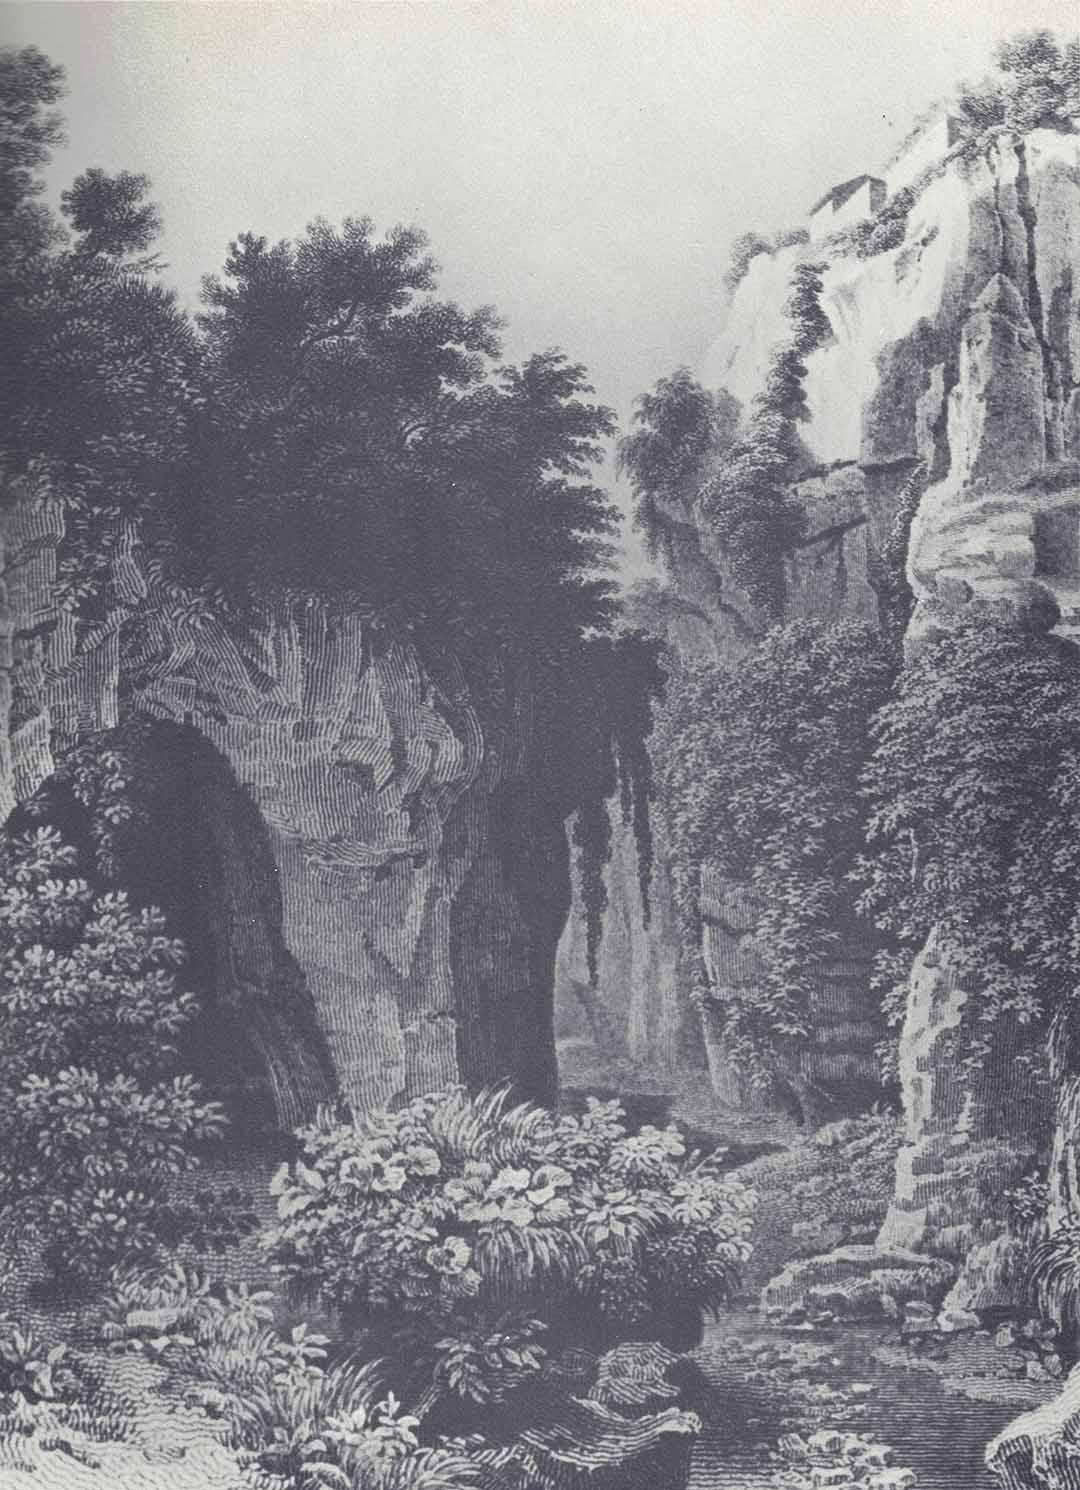 Lancelot-Théodore TURPIN DE CRISSÉ (Parigi 1782-Parigi 1859)- Pierre Eugène AUBERT (Parigi 1789 – Parigi 1847), Ravin de Sorrento